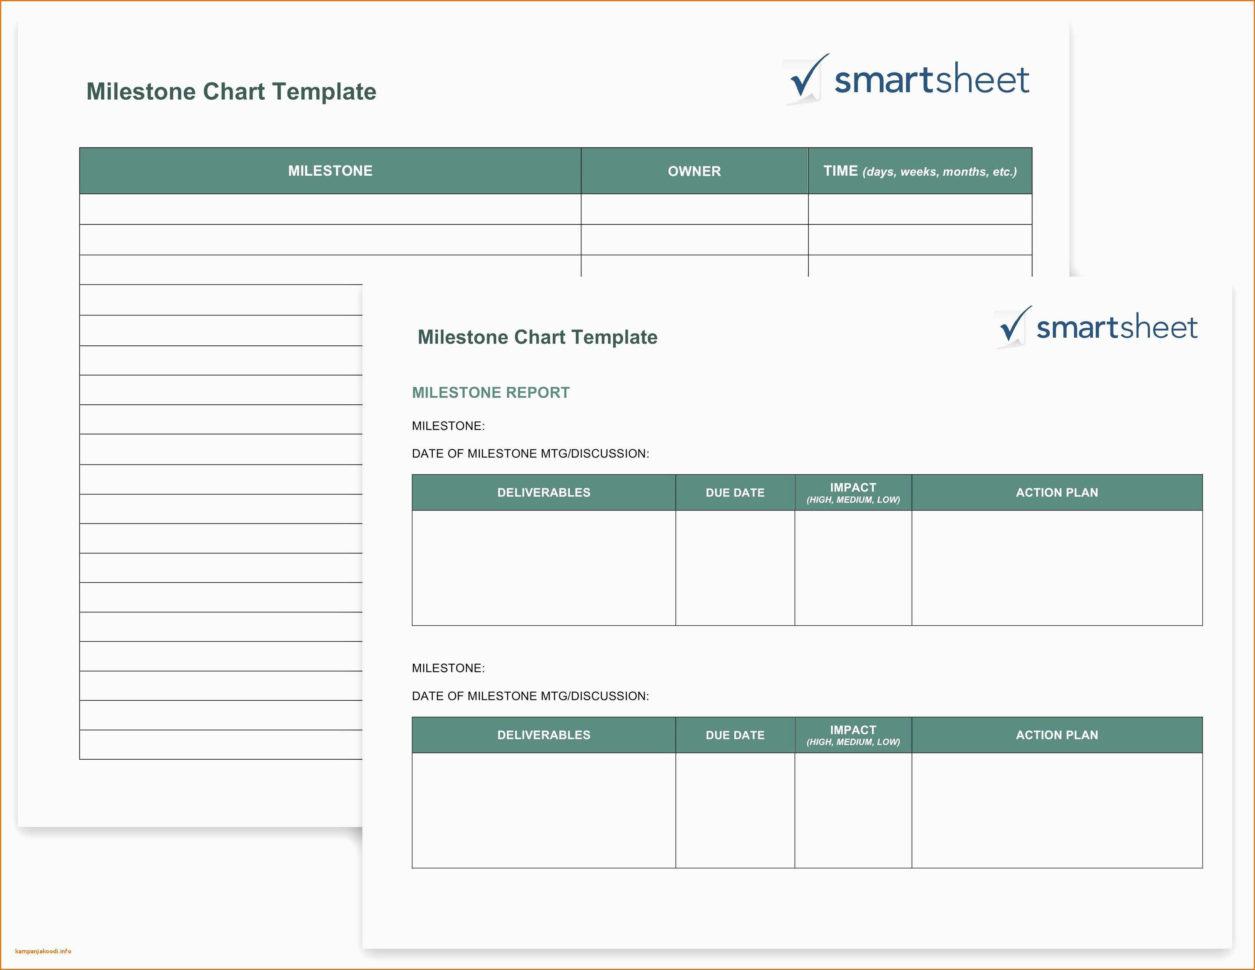 Vacation Spreadsheet Spreadshee Vacation Spreadsheet Template Vacation Spreadsheet For